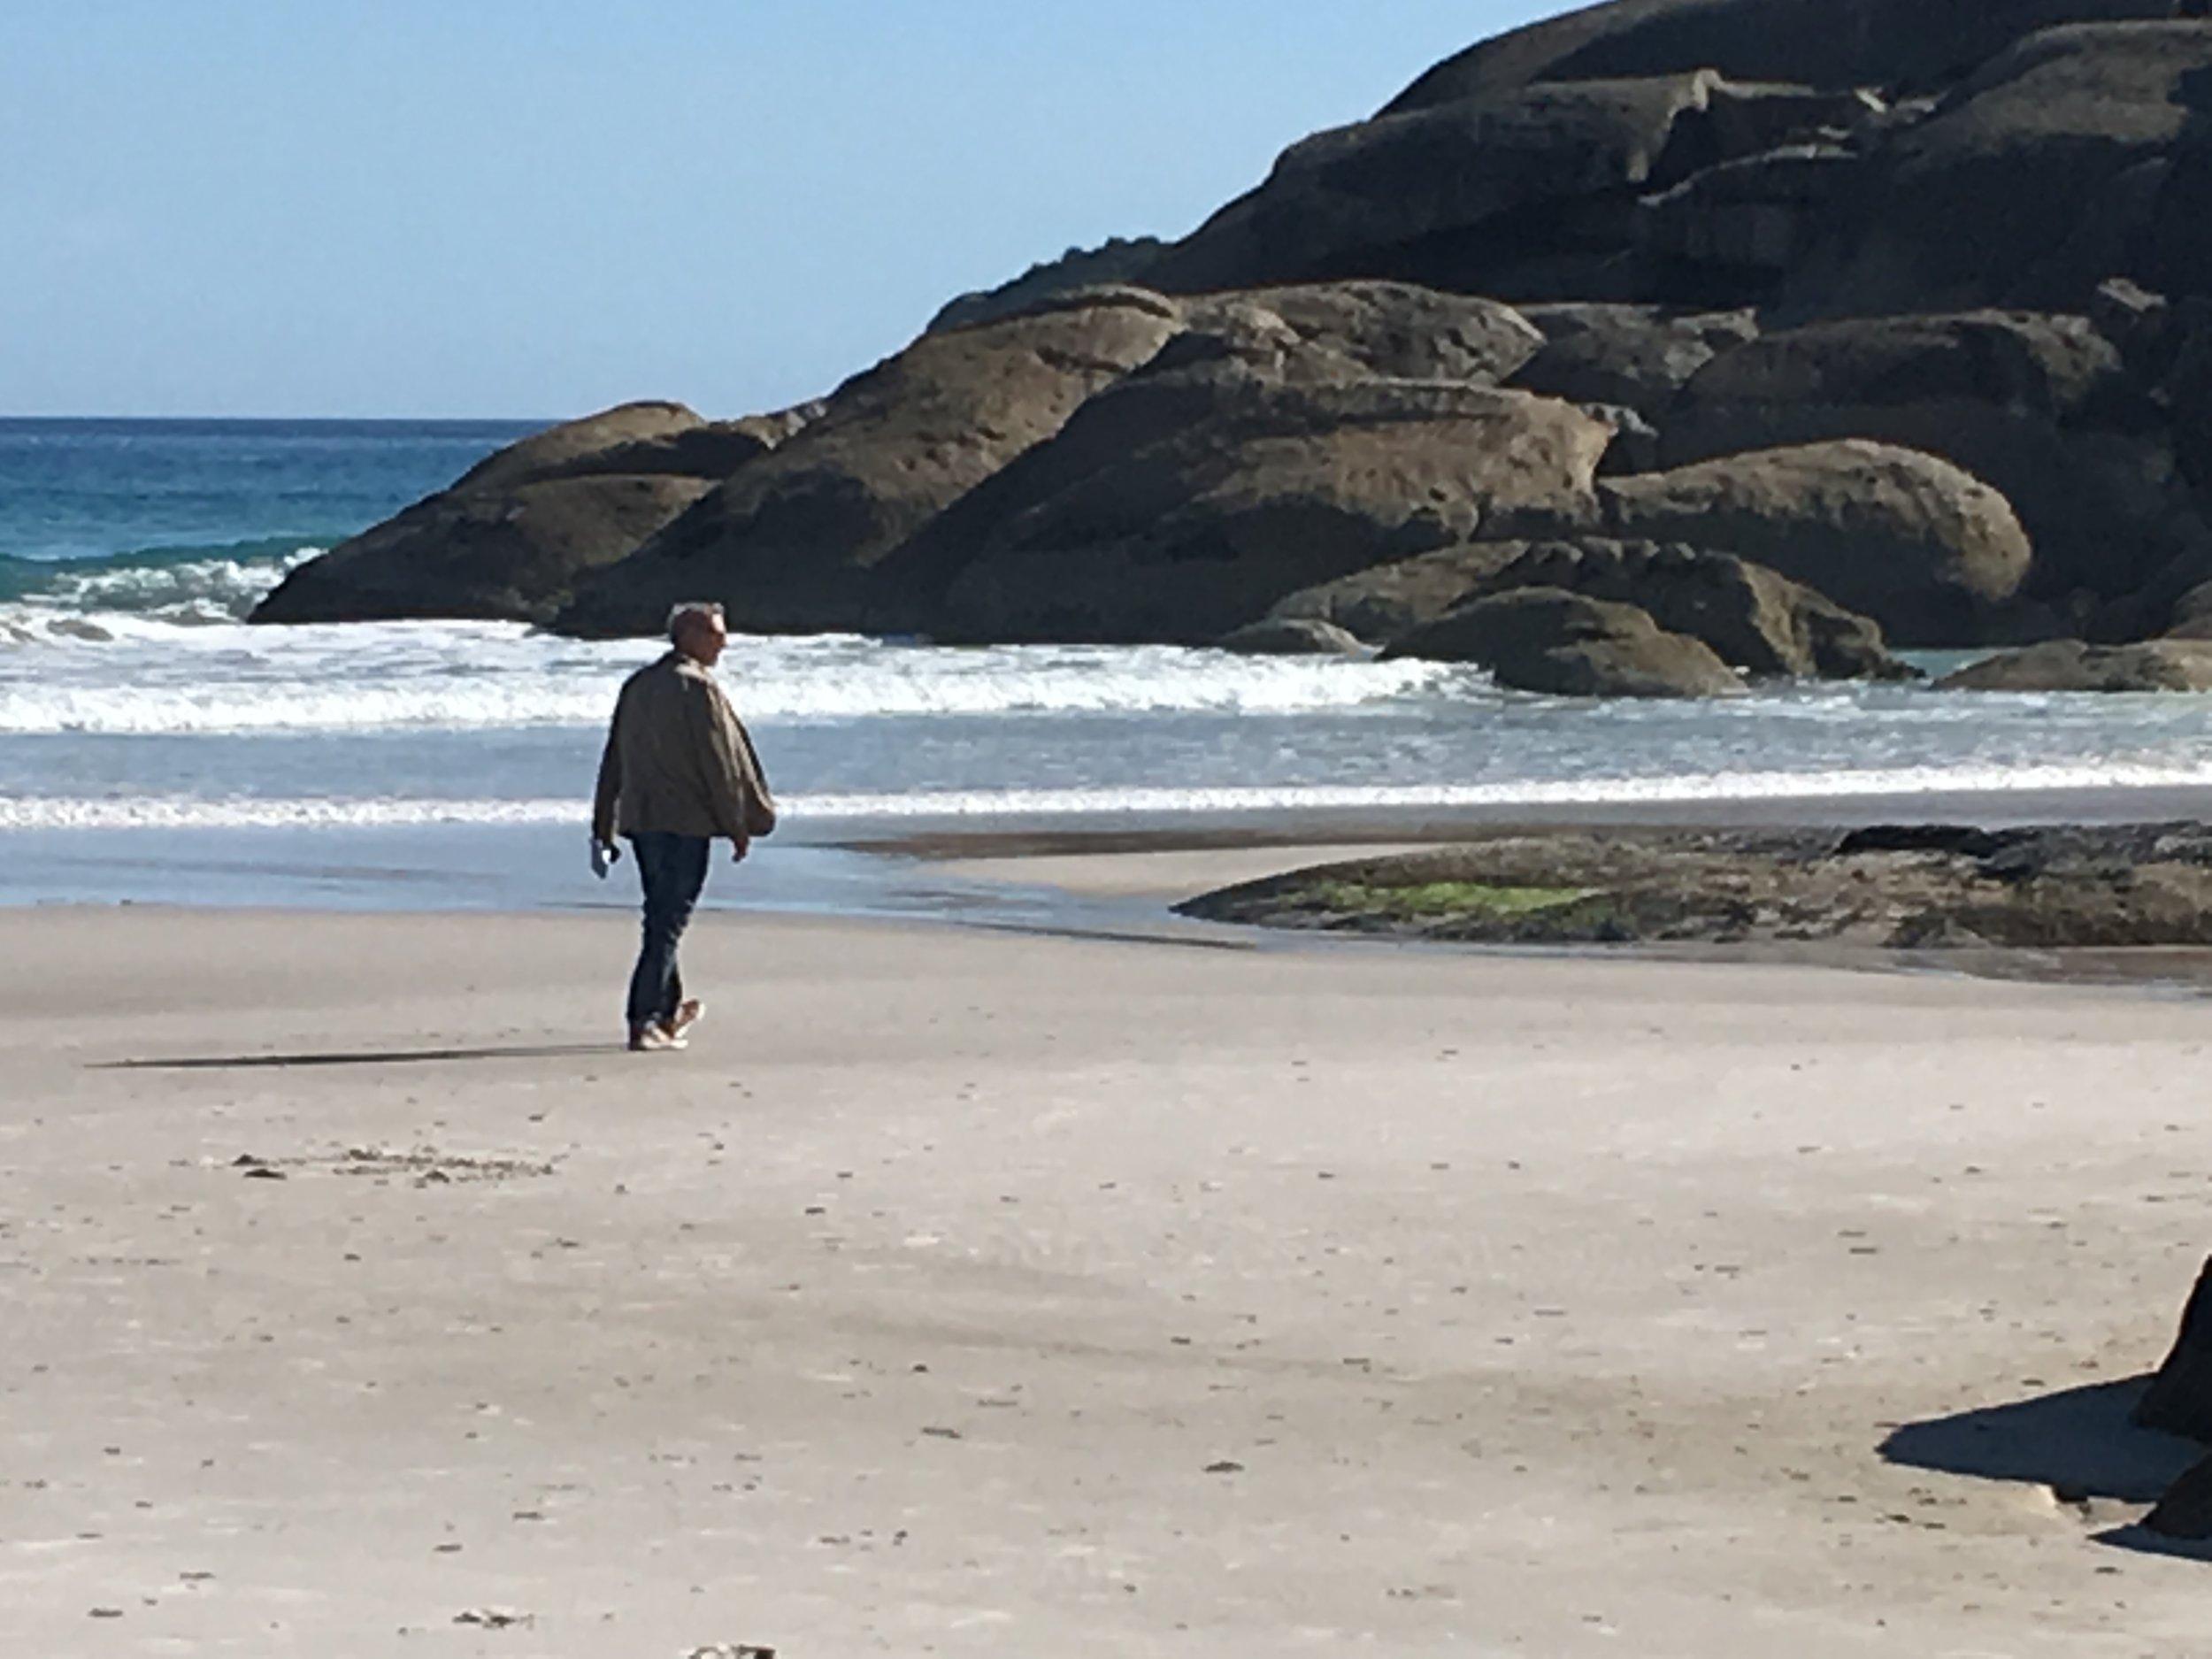 Squeaky Beach - no really